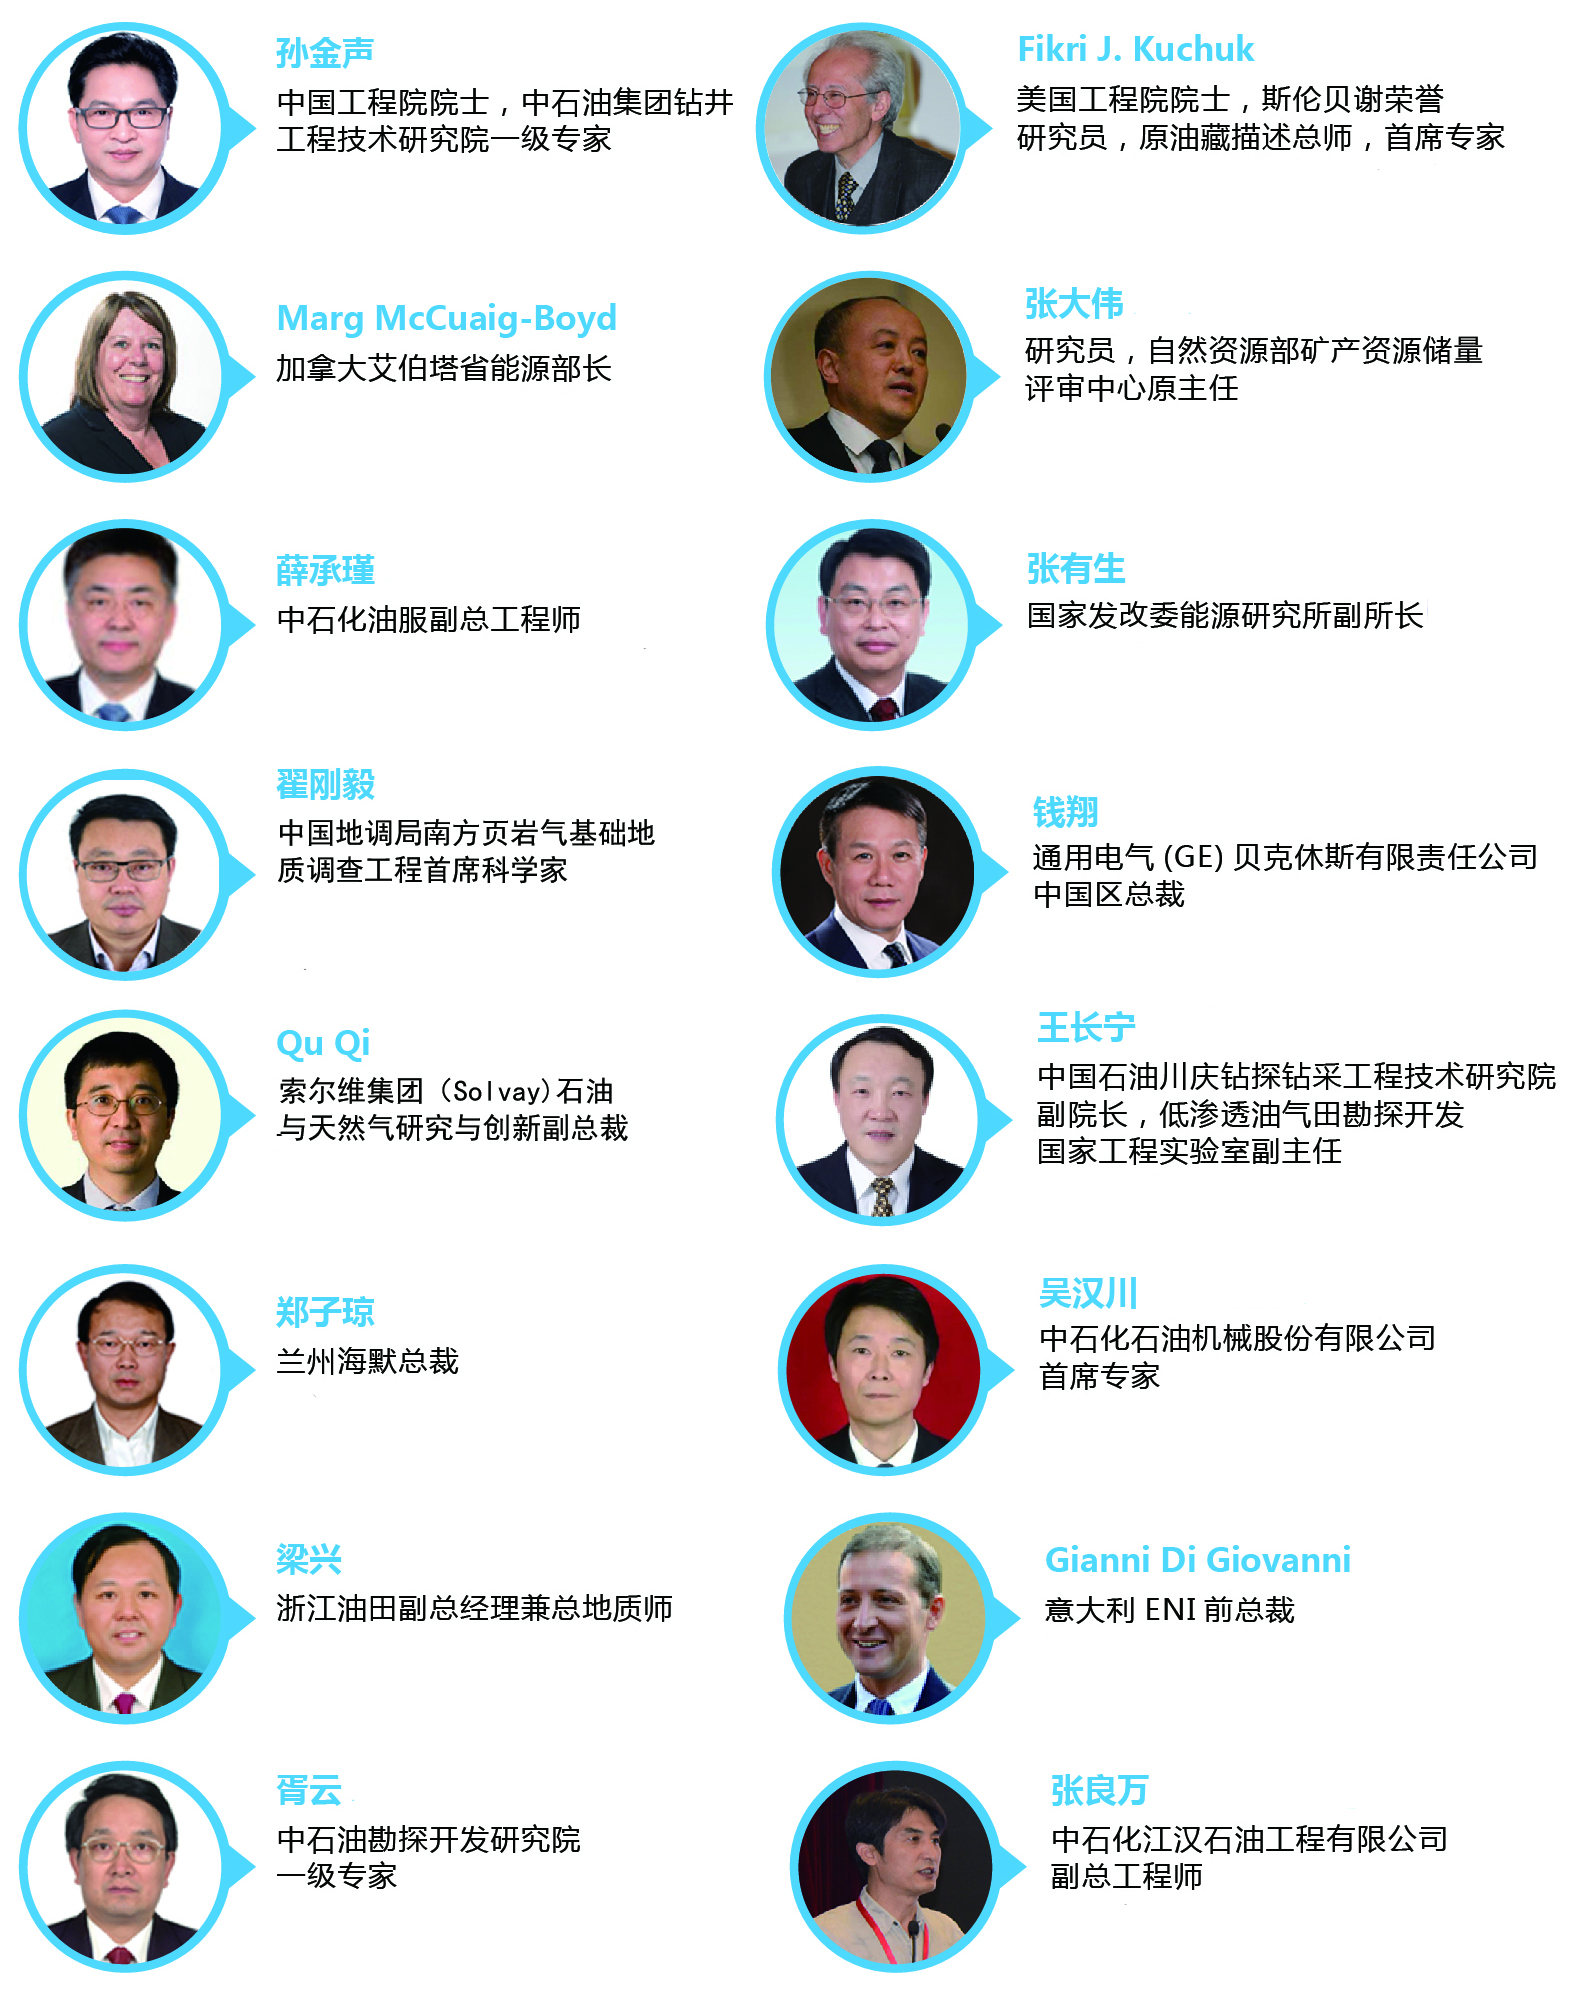 ECF国际页岩气论坛2019第九届亚太页岩油气峰会(上海)